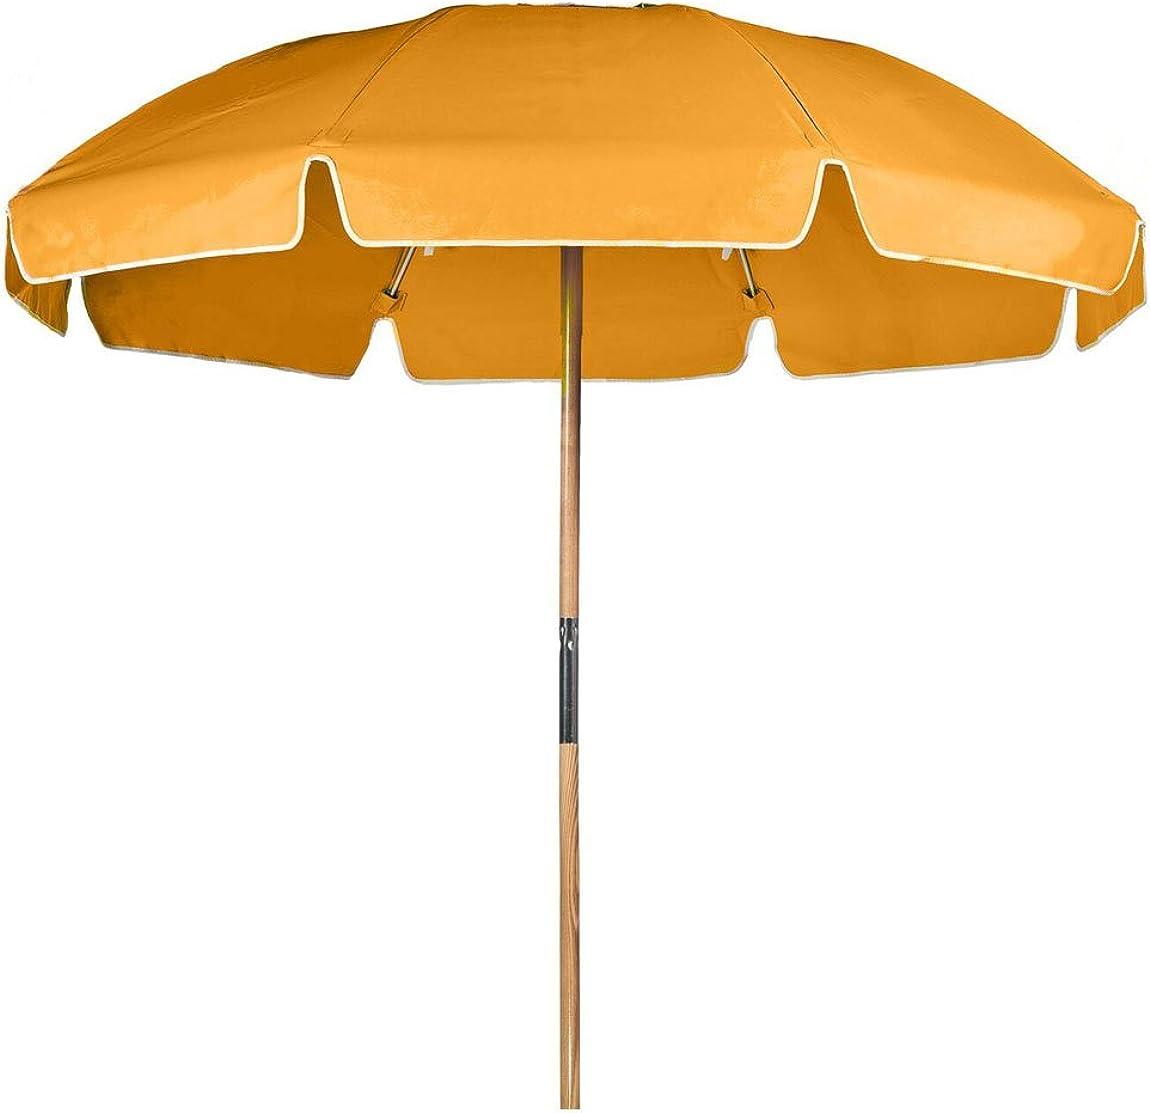 7.5 ft. Steel Commercial Grade Heavy Duty Beach Umbrella